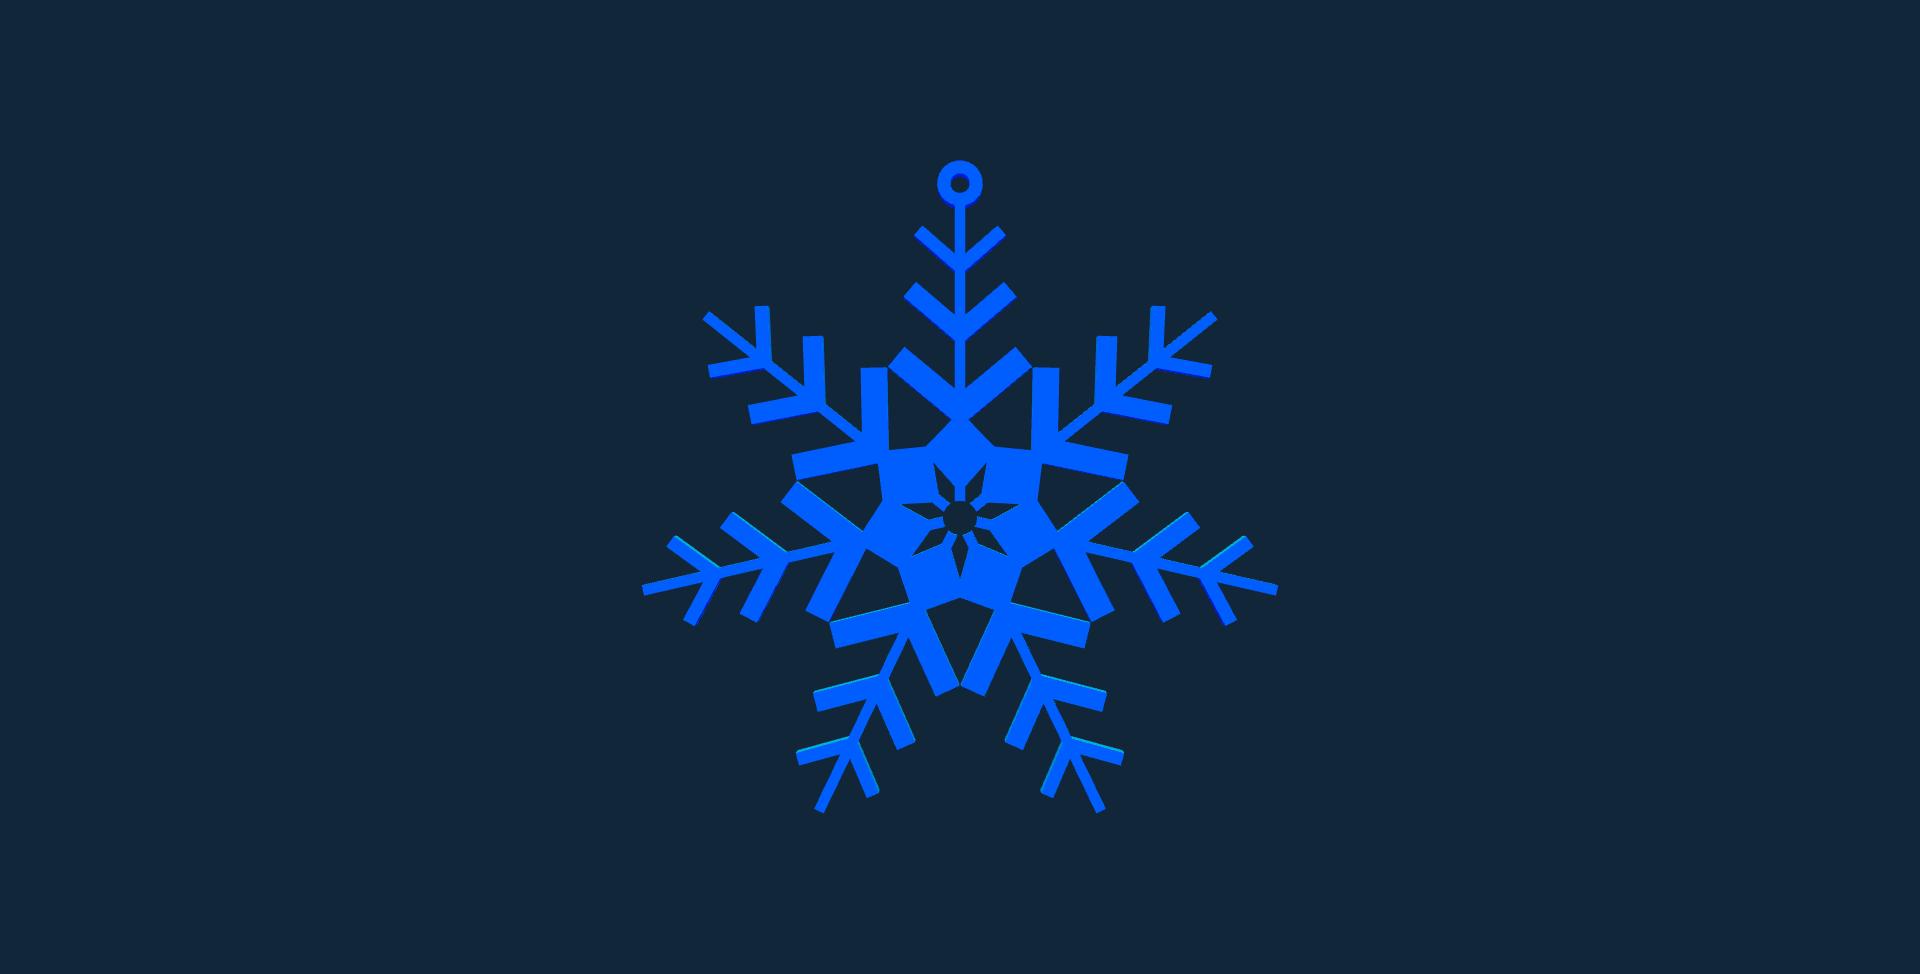 Snowflake design 4 stl file